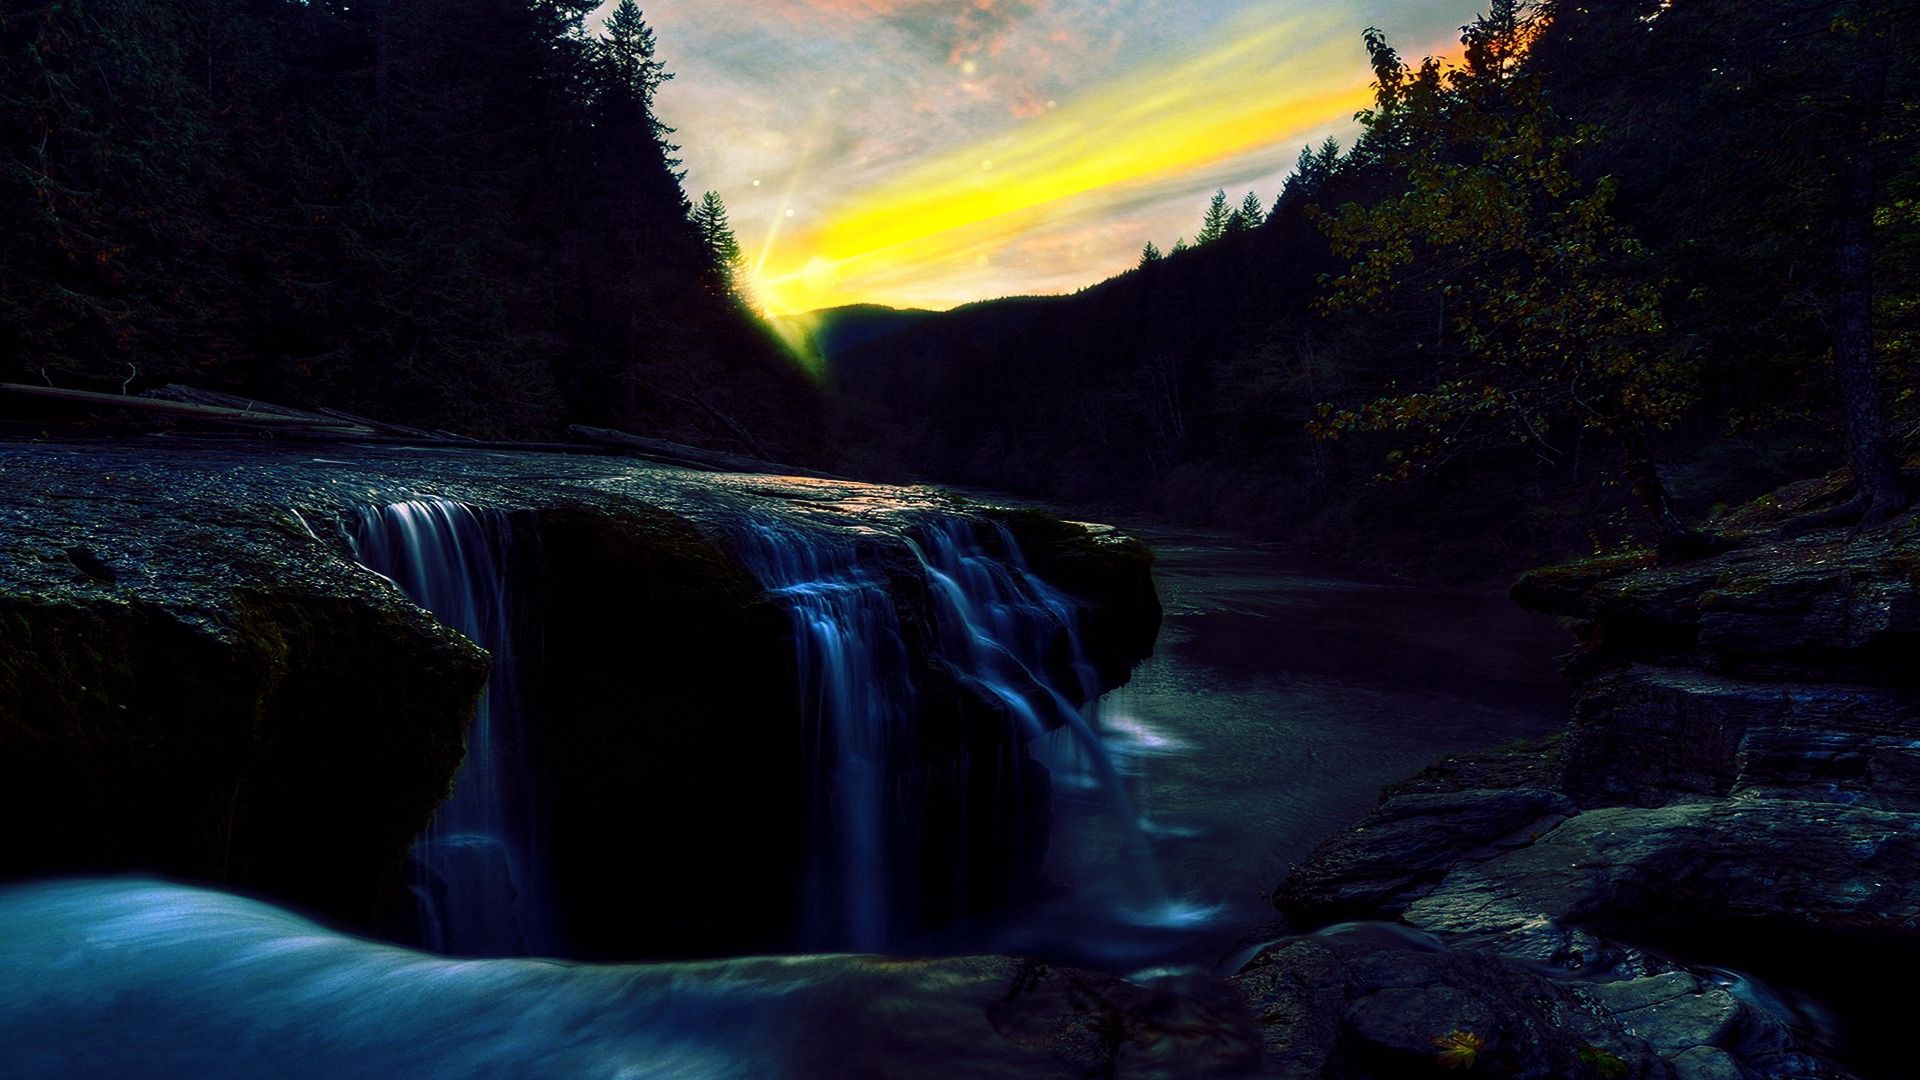 126514 скачать обои Природа, Лес, Река, Водопад, Обрыв, Закат, Вечер, Сумерки, Камни, Пейзаж - заставки и картинки бесплатно